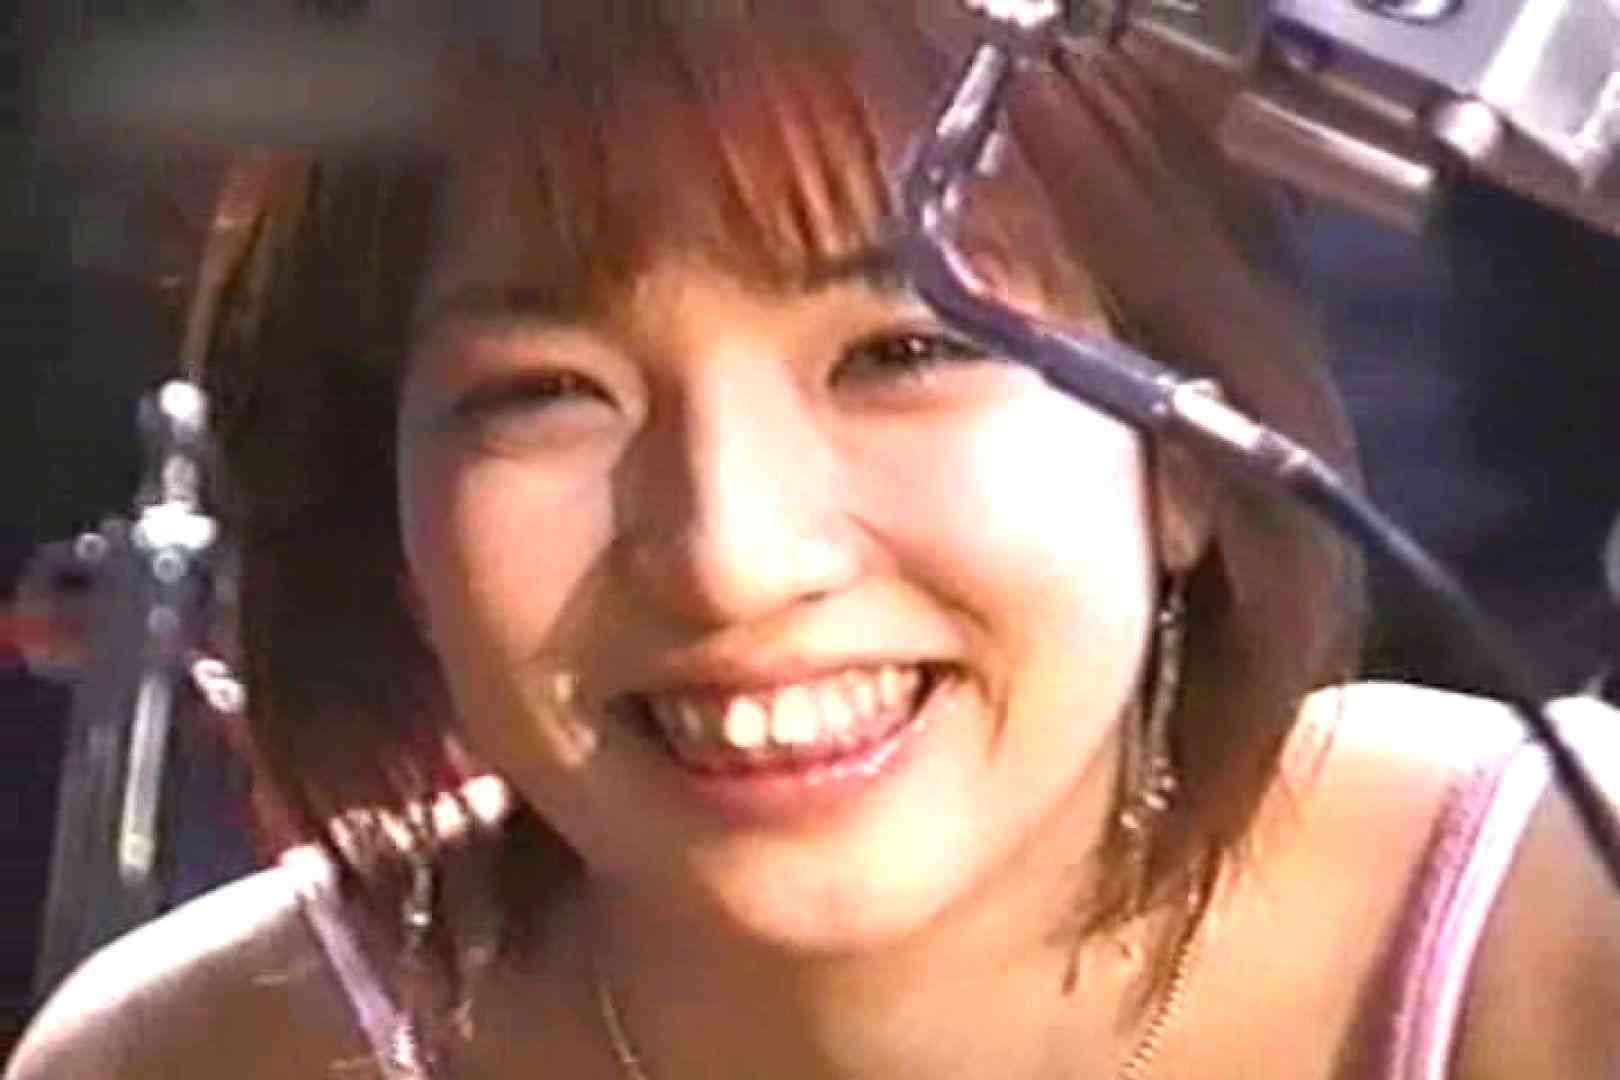 RQカメラ地獄Vol.23 コスチューム すけべAV動画紹介 106pic 83